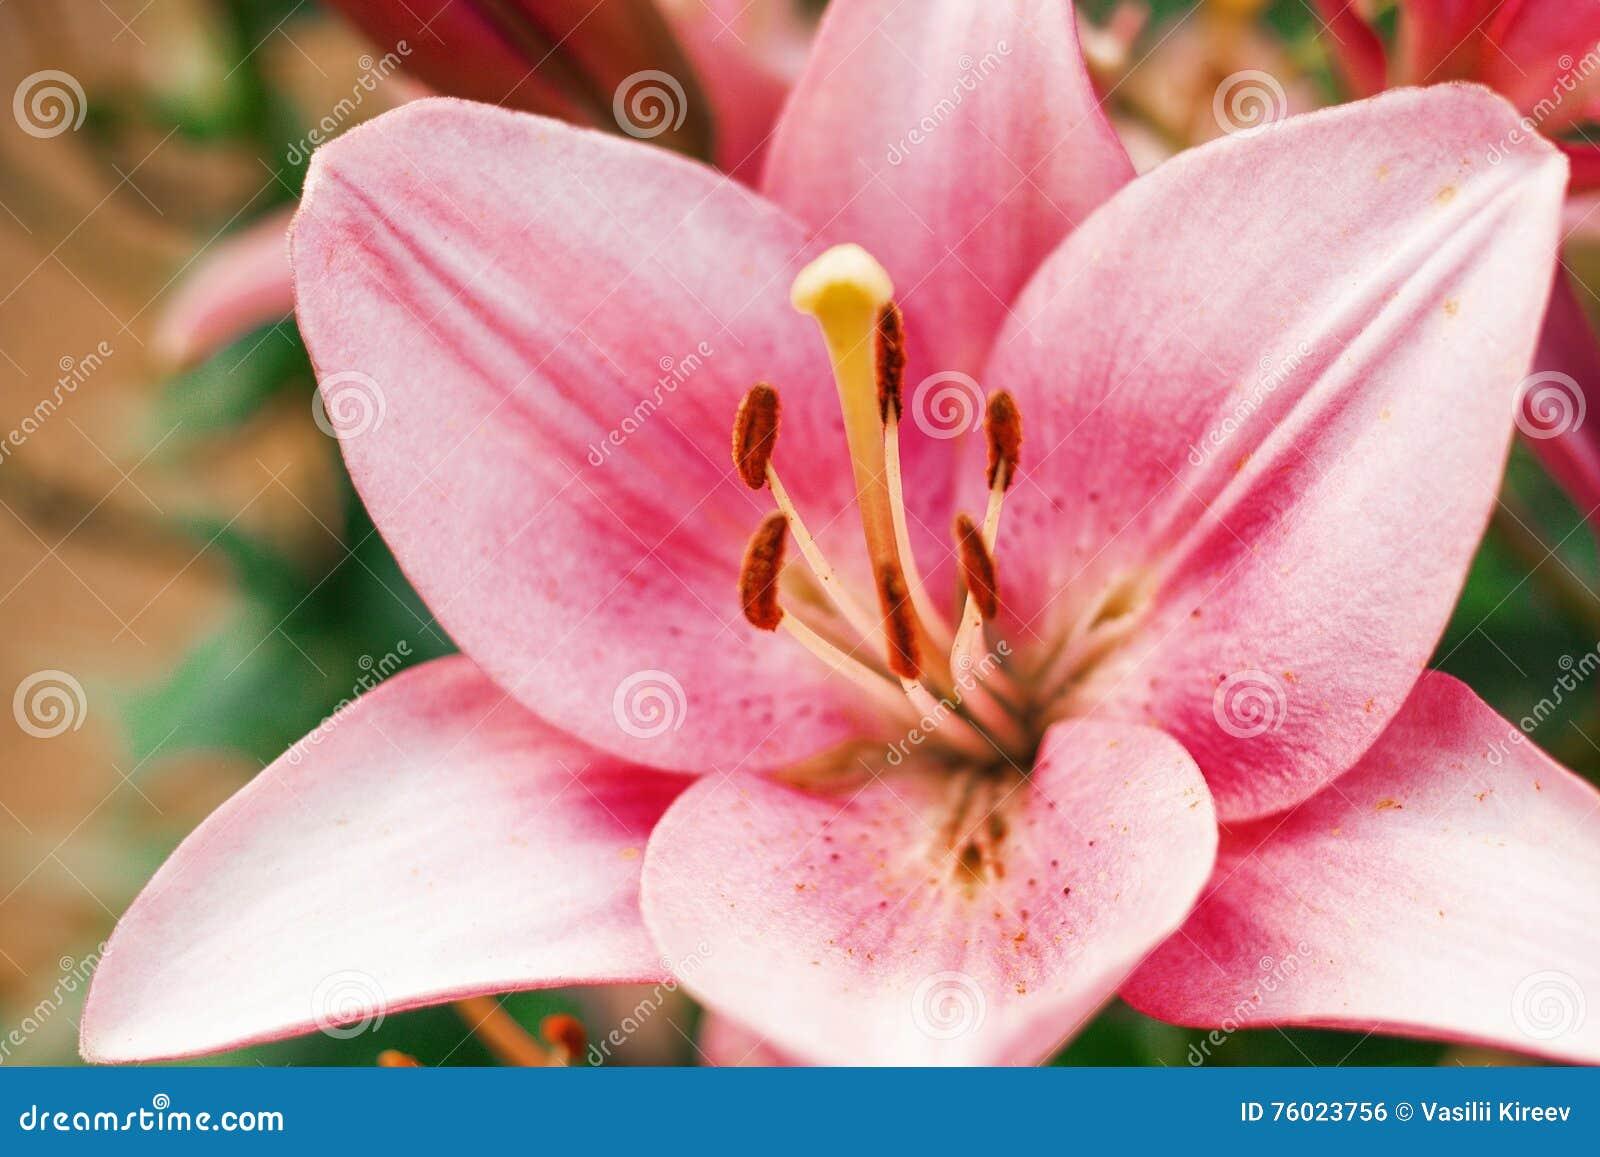 Zephyranthes flower common names for species in this genus include zephyranthes flower common names for species in this genus include fairy lily rainflower izmirmasajfo